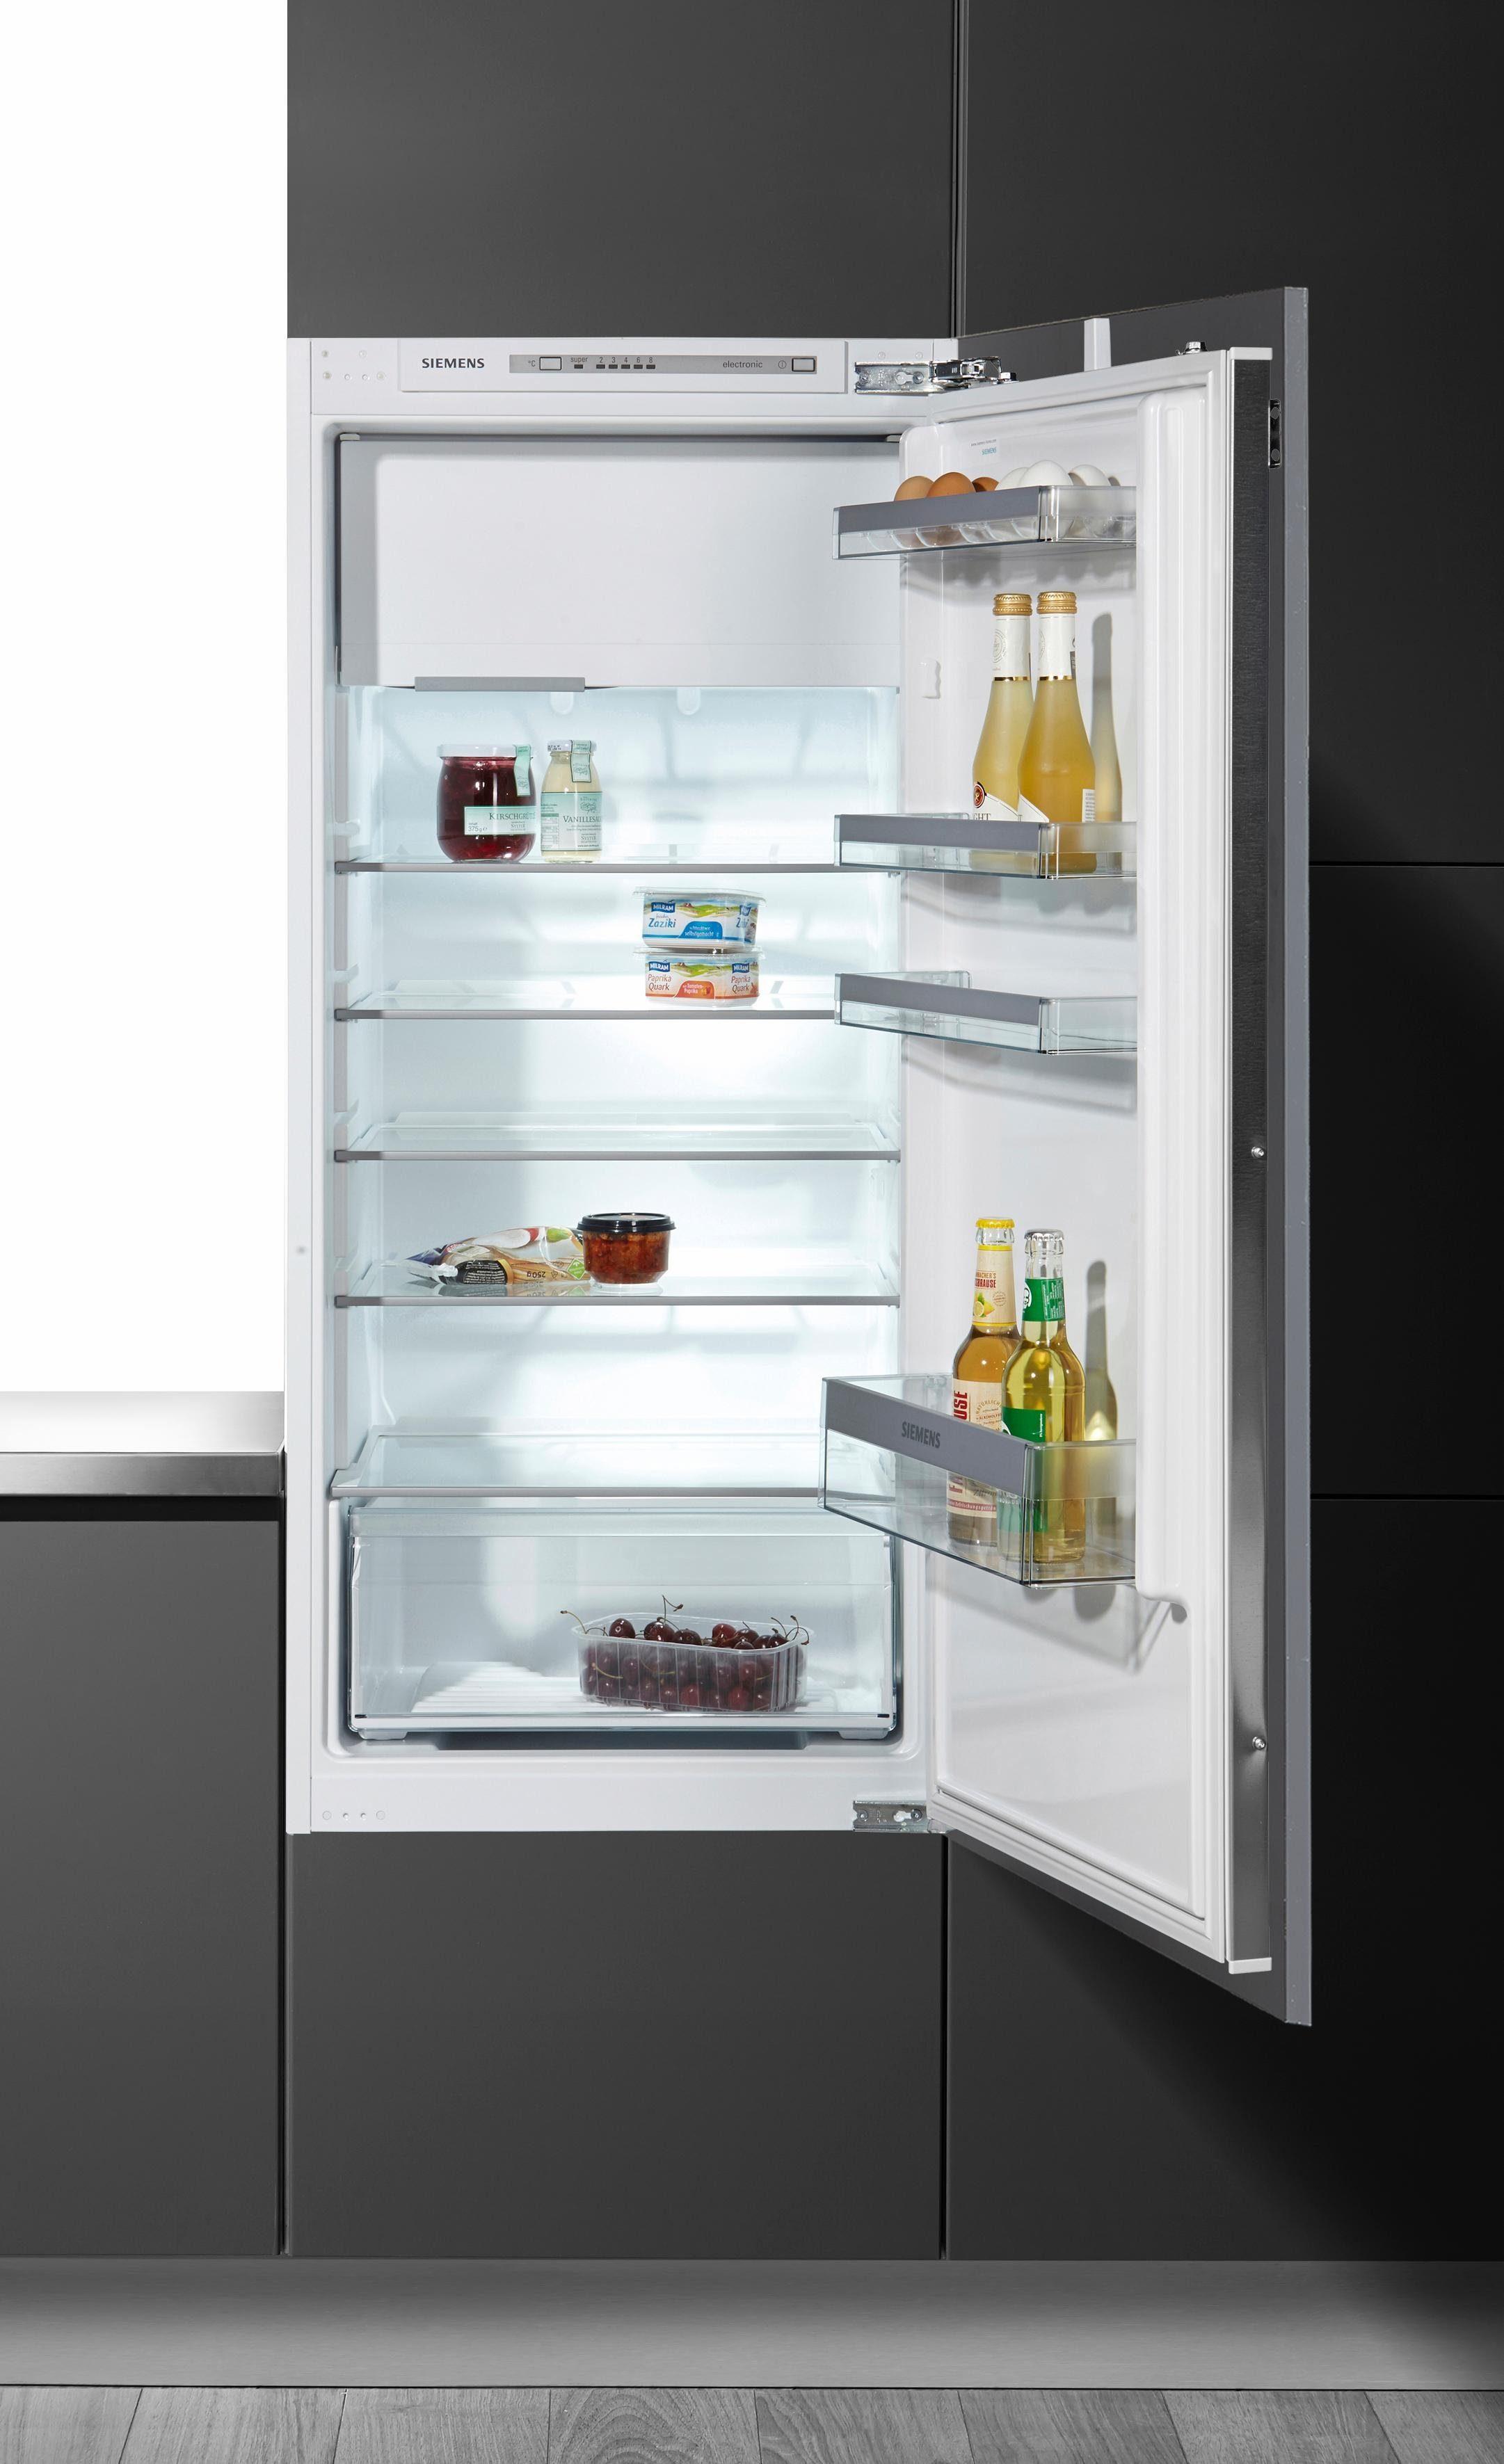 Siemens Einbau-Kühlautomat KI42LVF30, A++, 122,1 cm hoch